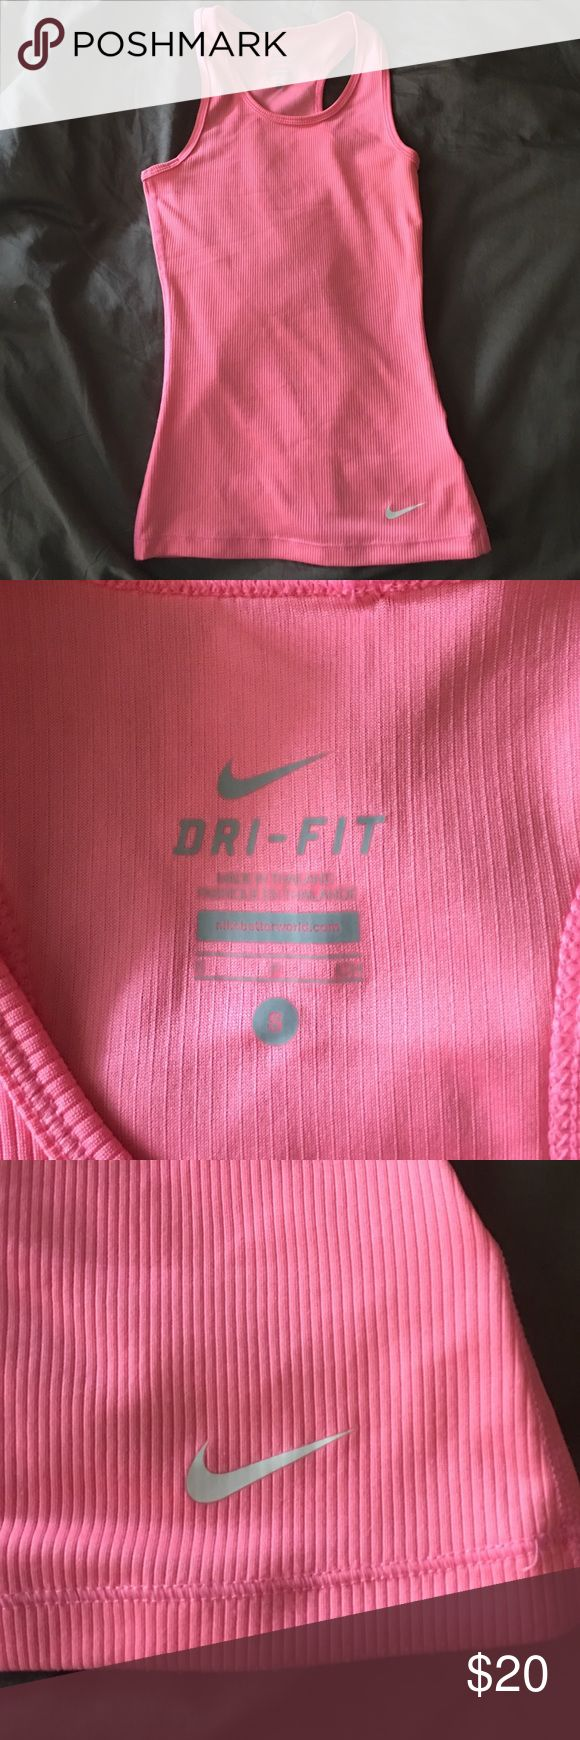 girls pink nike tank top girls size small, pink nike tank top Nike Shirts & Tops Tank Tops